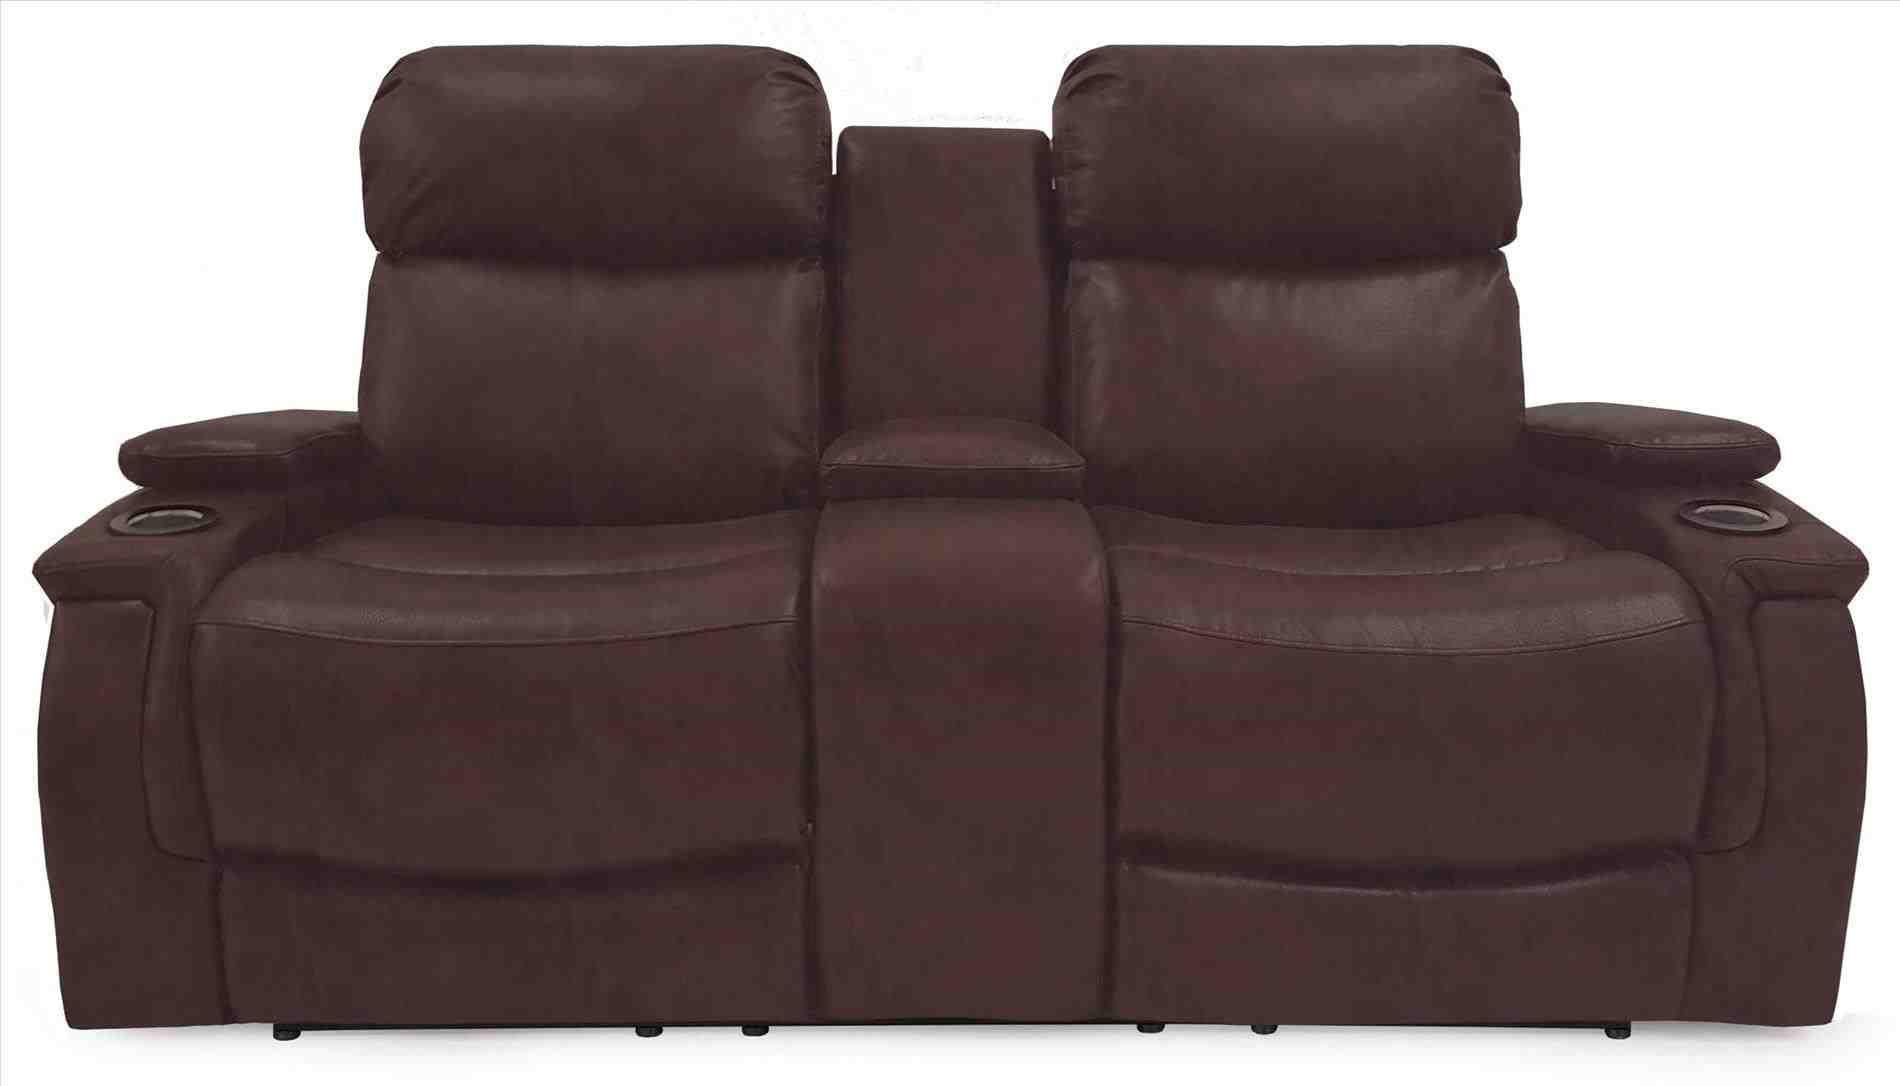 Cheap Recliners Okc Bobs Furniture Recliner Chair